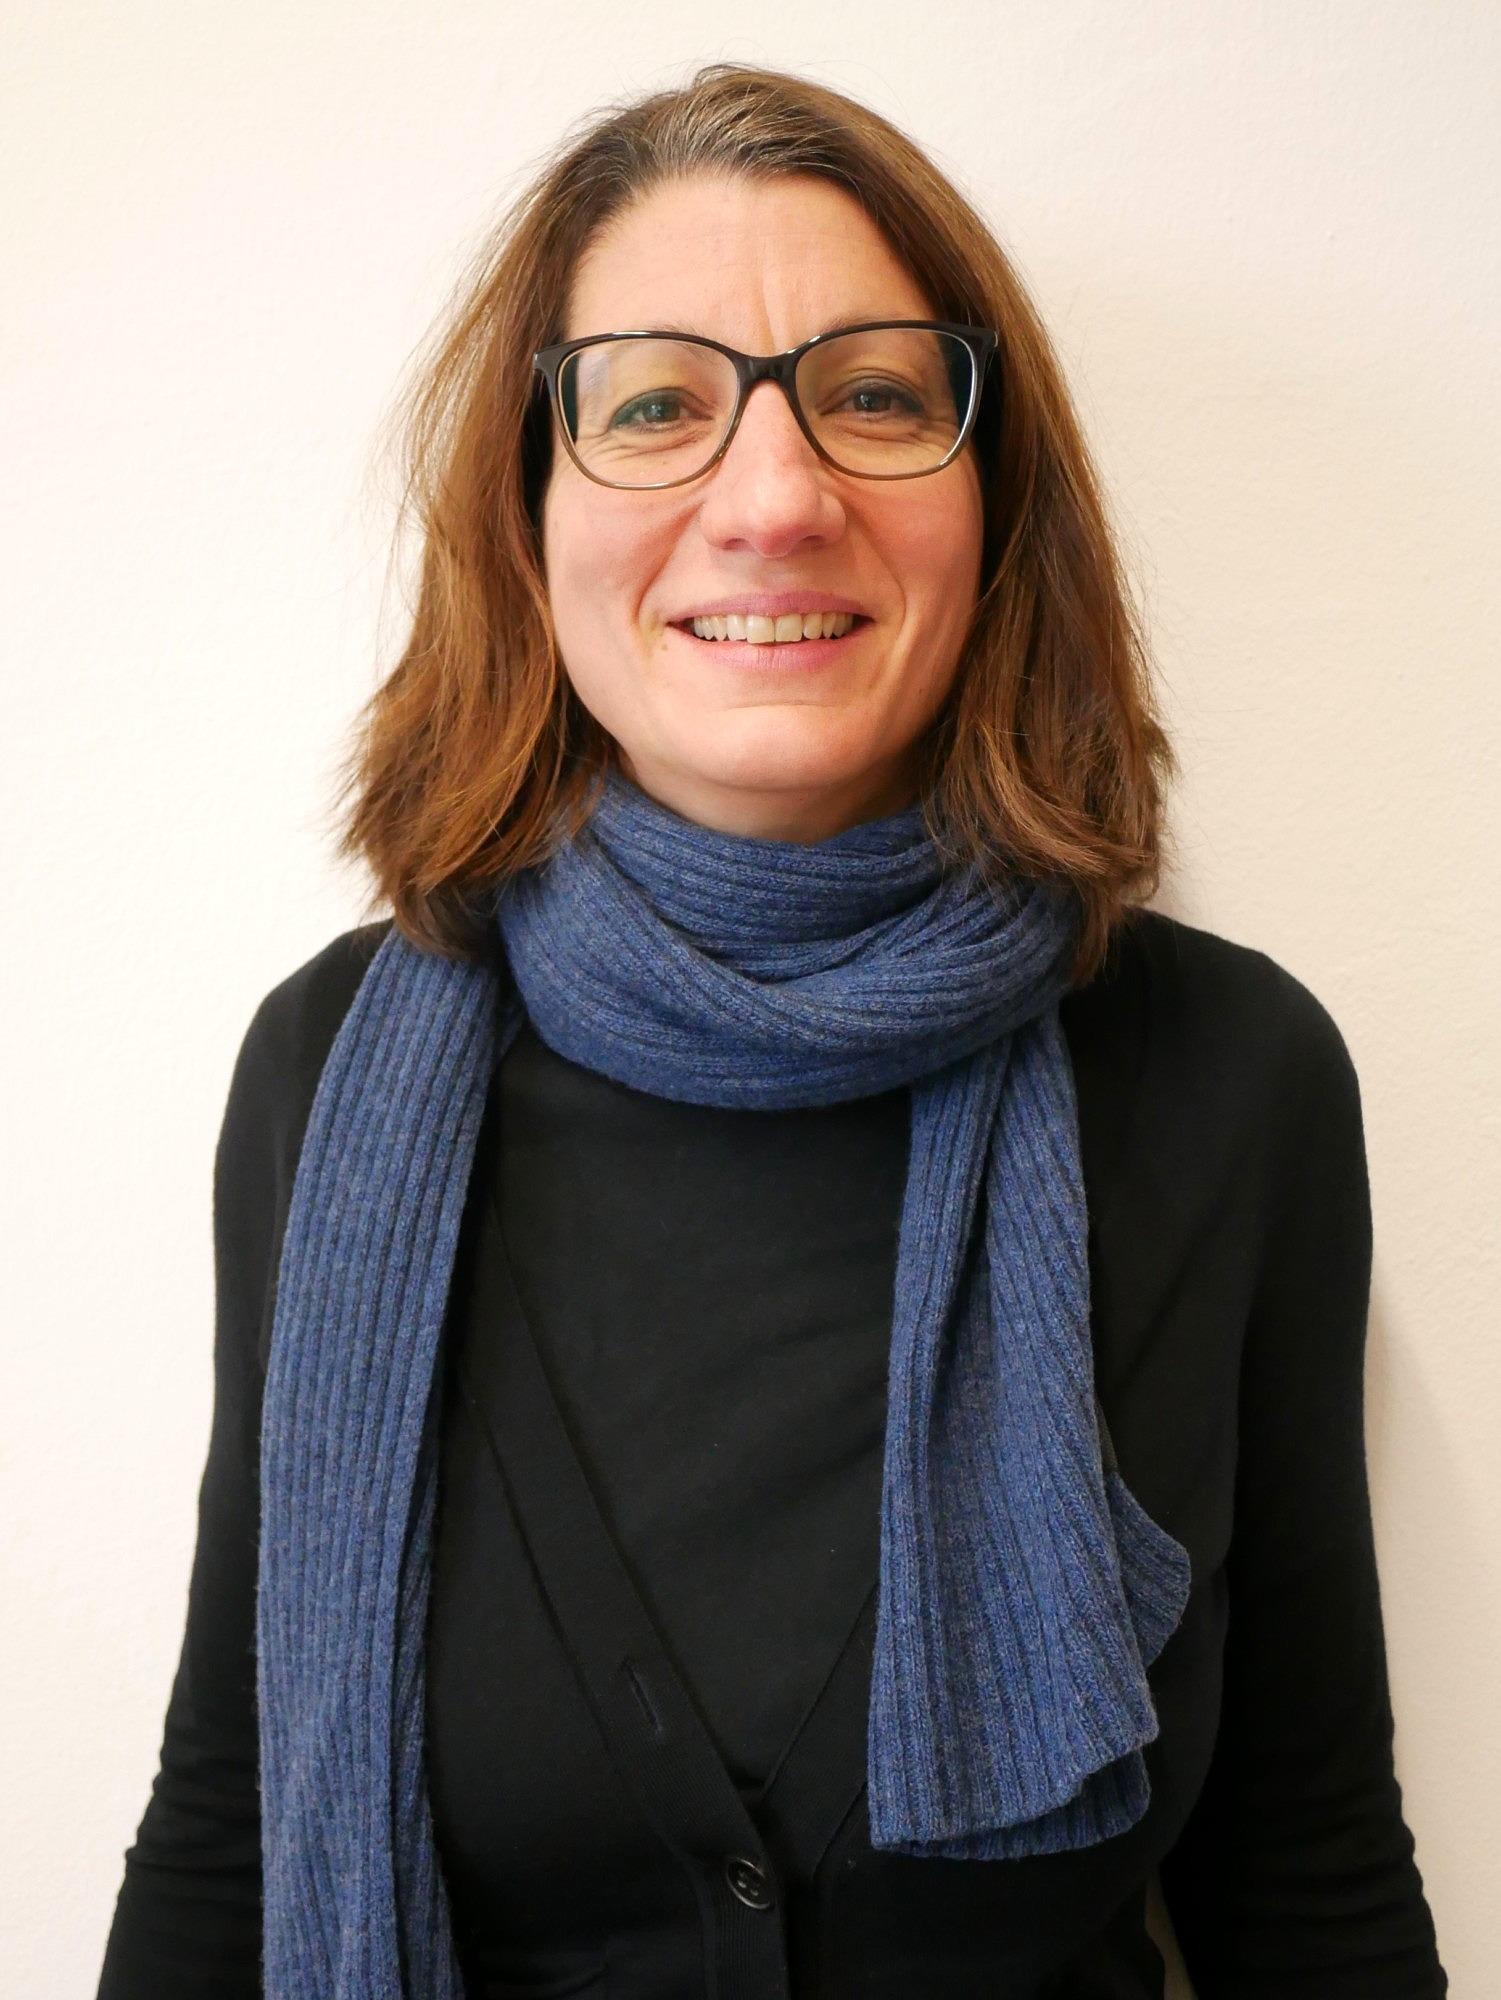 Bettina Brockmeyer